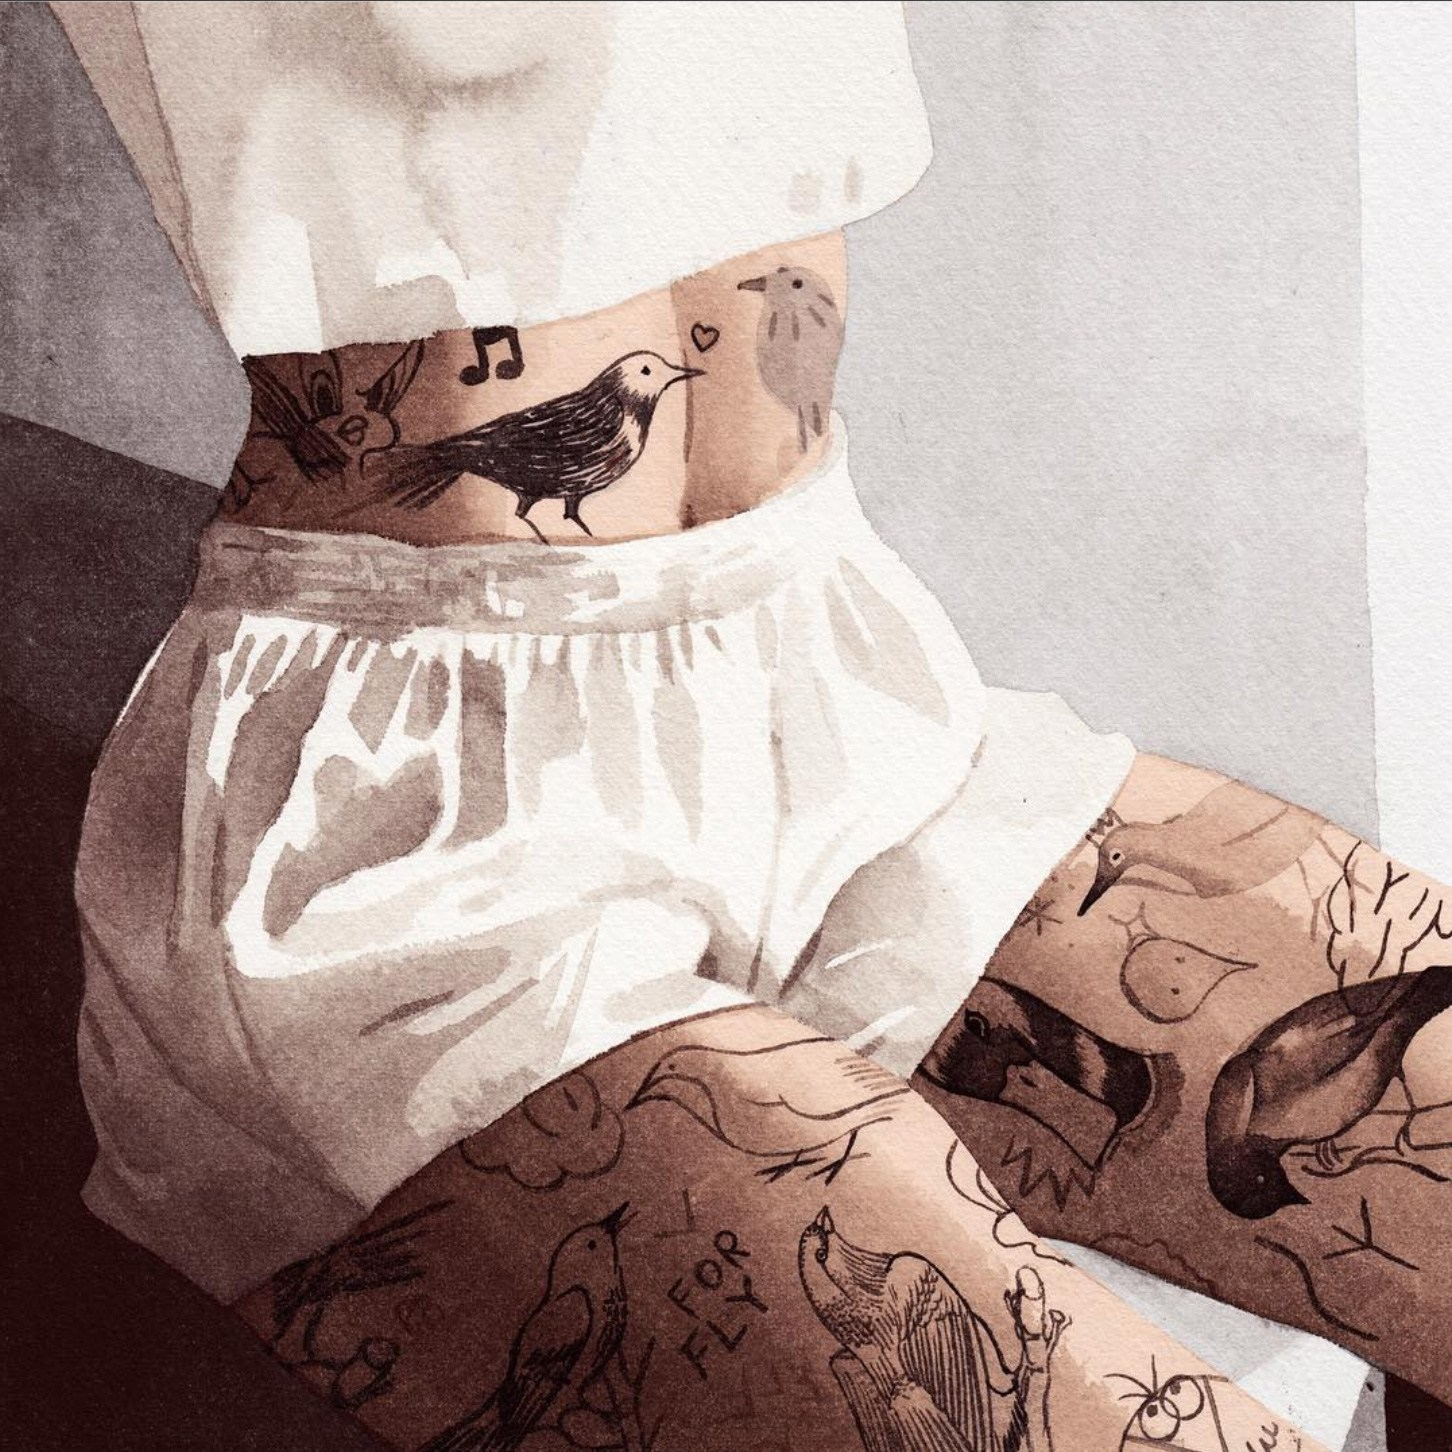 I corpi tatuati NSFW Jean Andre | Collater.al 2